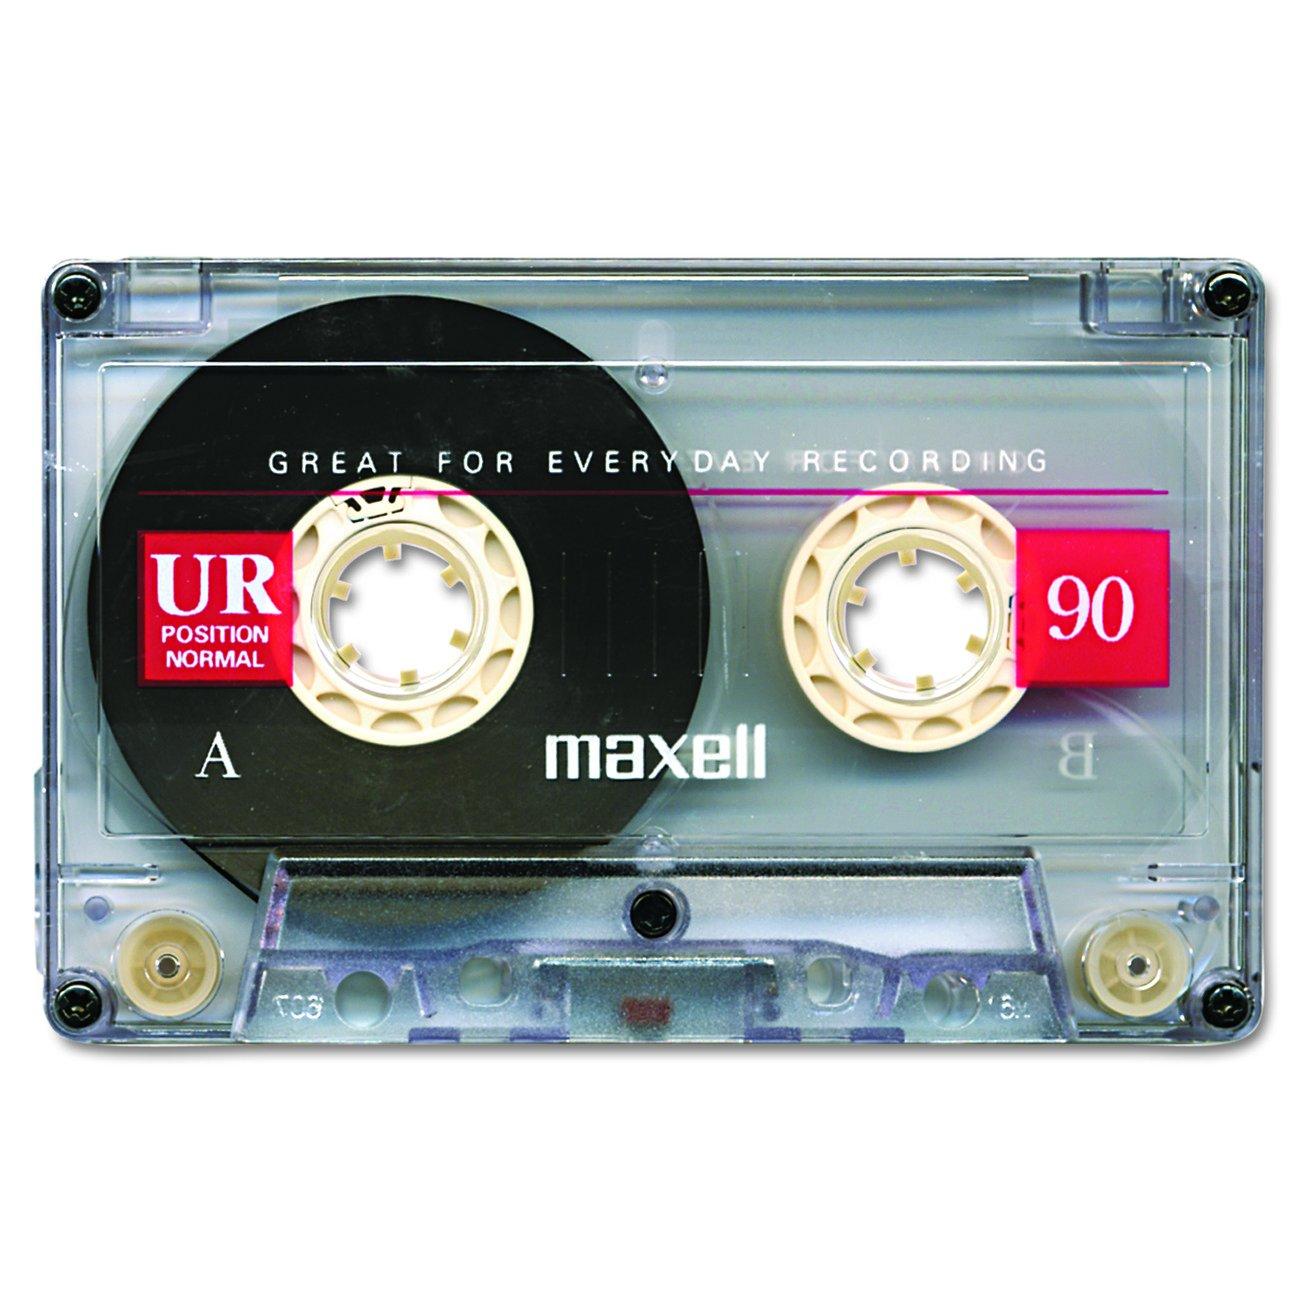 maxell normal bias audio cassette tape 90 minute pl1 2582 ur90 nib ebay. Black Bedroom Furniture Sets. Home Design Ideas